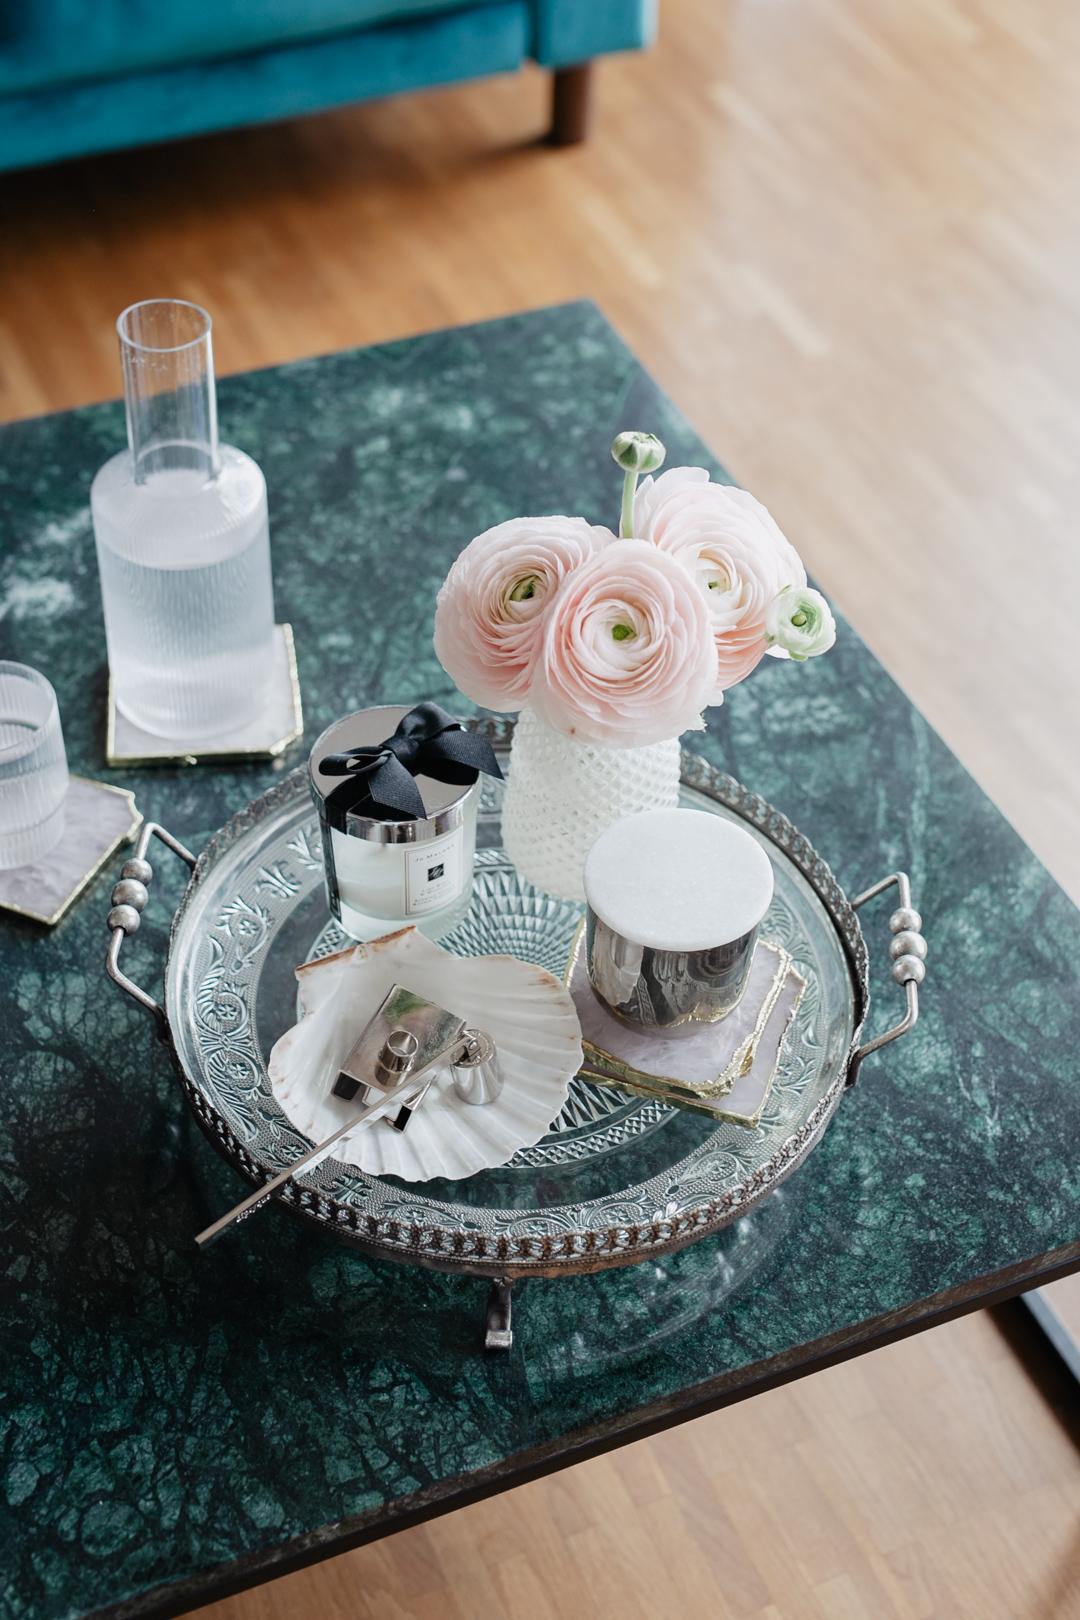 Frühlingsstimmung für Zuhause - Pieces of Mariposa // Lifestyle Blog aus Nürnberg